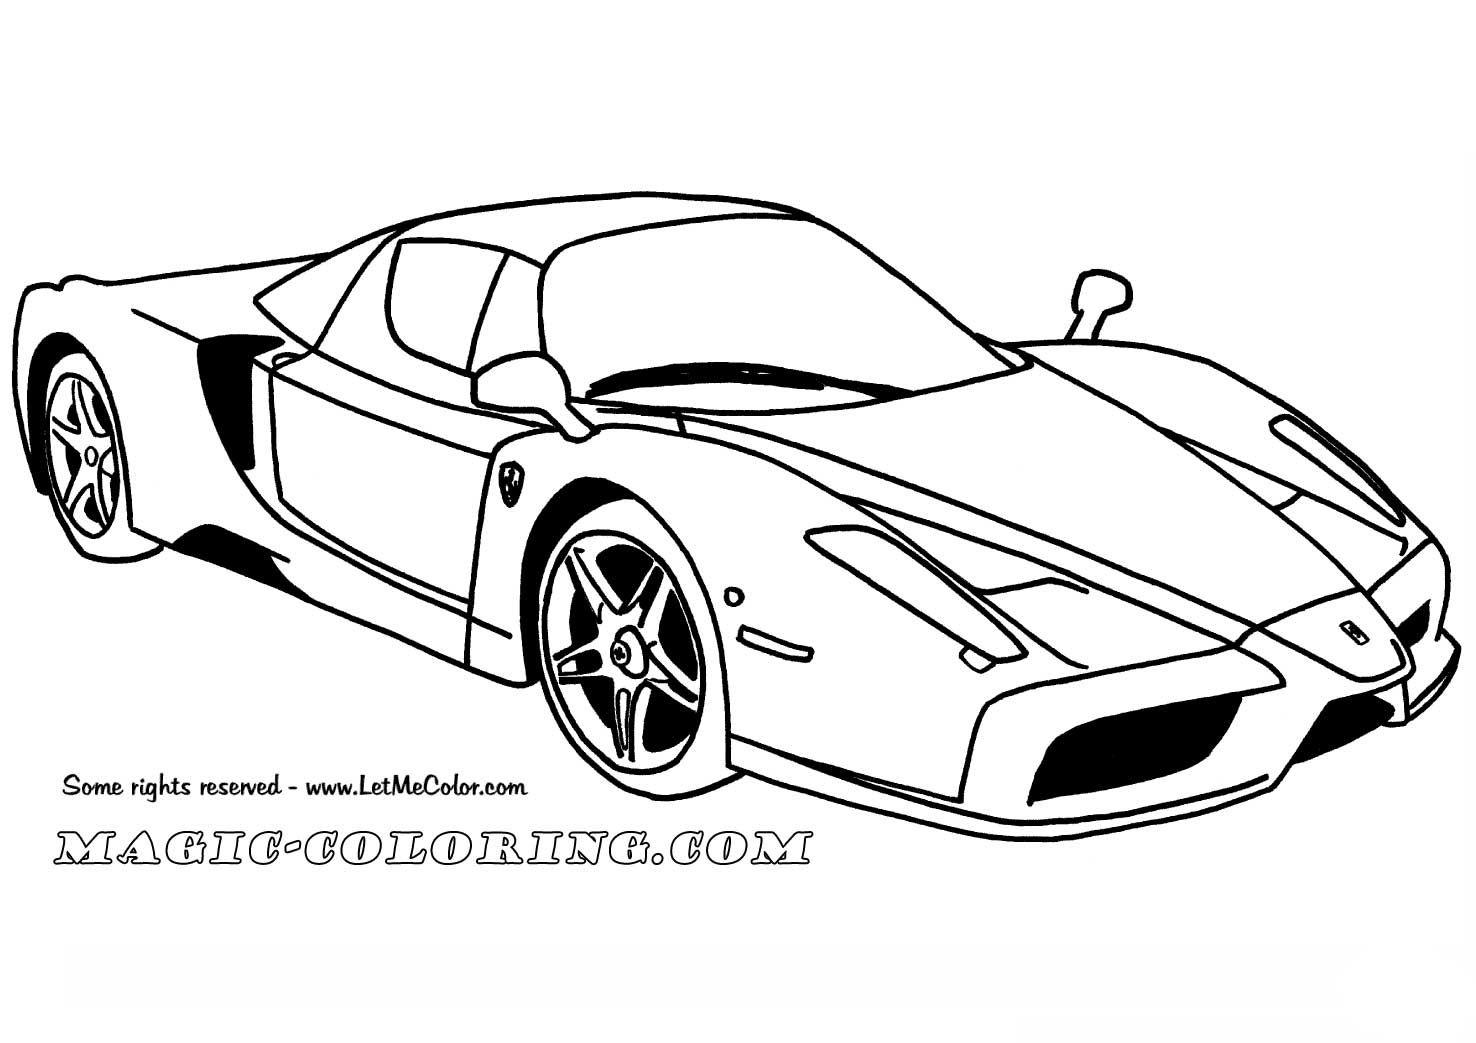 Ferrari Enzo Car Coloring Page Race Car Coloring Pages Cars Coloring Pages Sports Coloring Pages